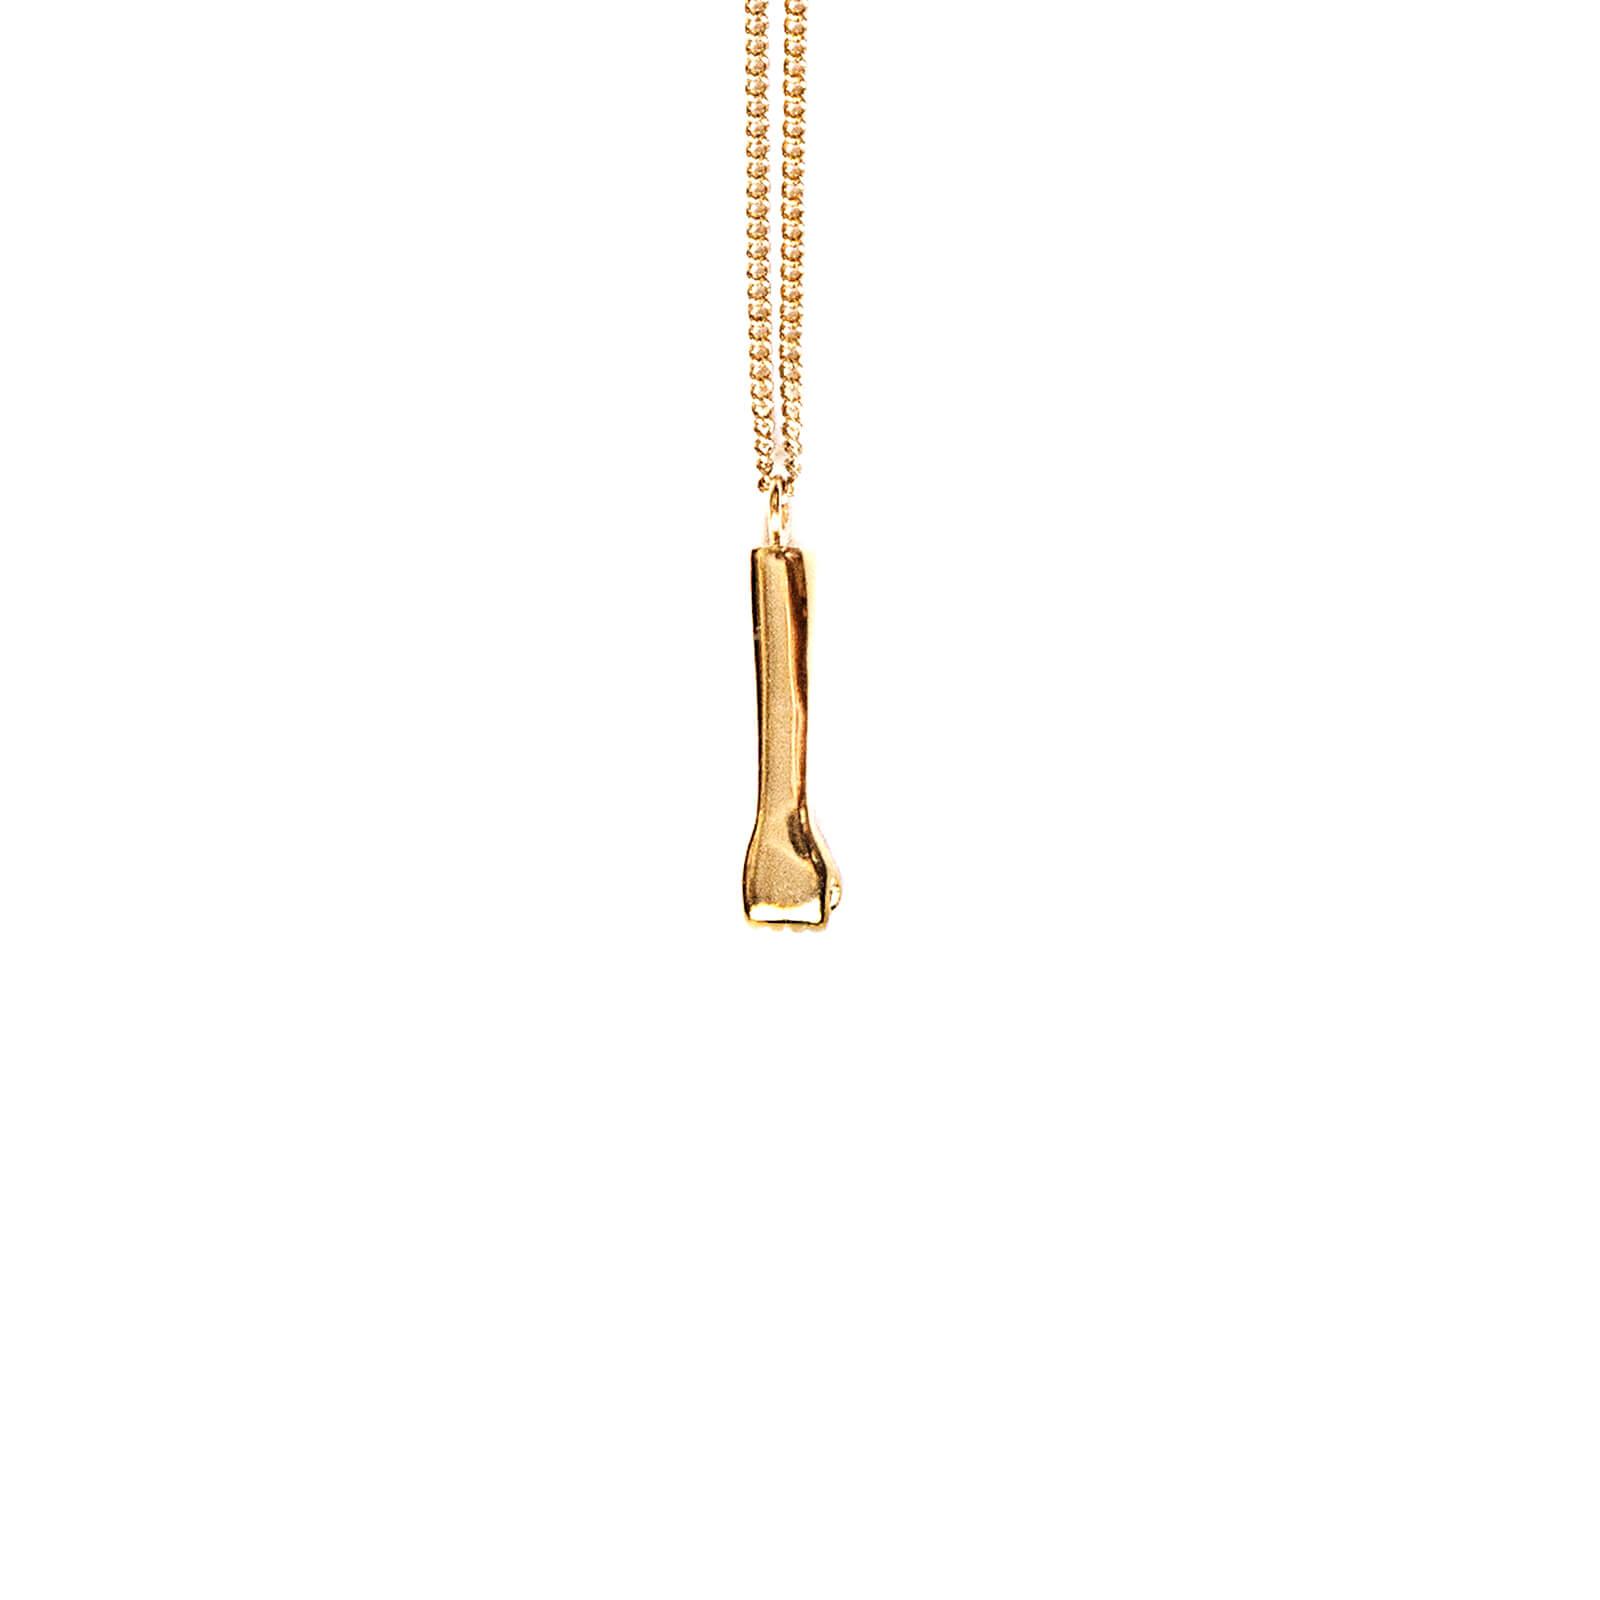 The rock pendant gold glenda lpez jewelry design the rock pendant gold by glenda lopez frontal aloadofball Gallery